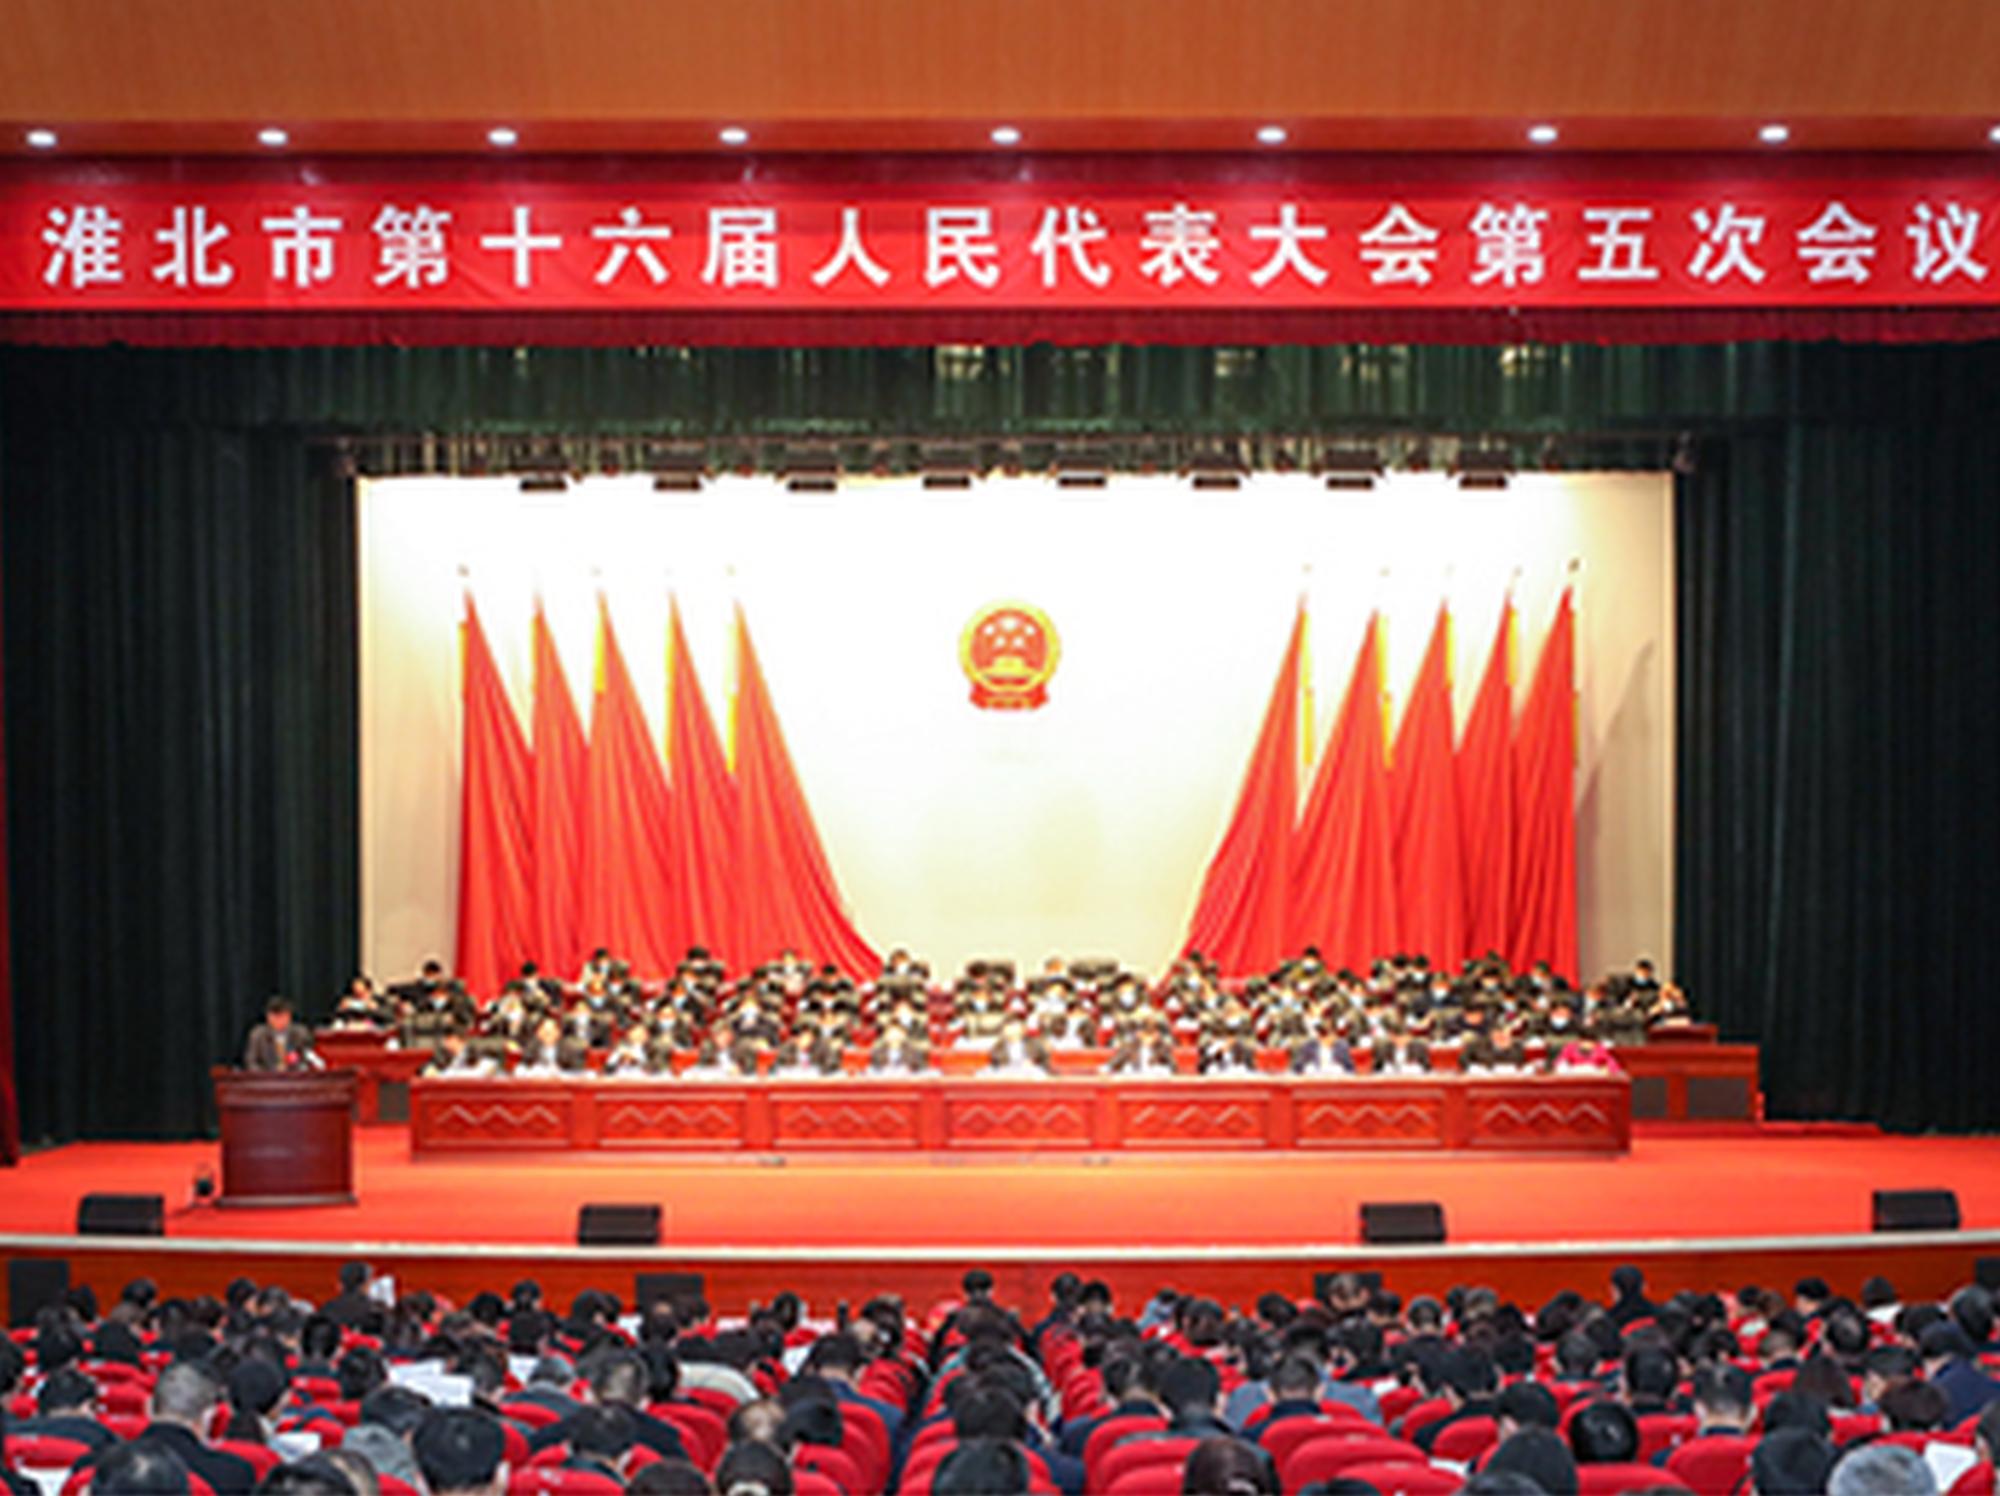 http://ah.sina.com.cn/news/2021-01-22/detail-ikftssan8894314.shtml